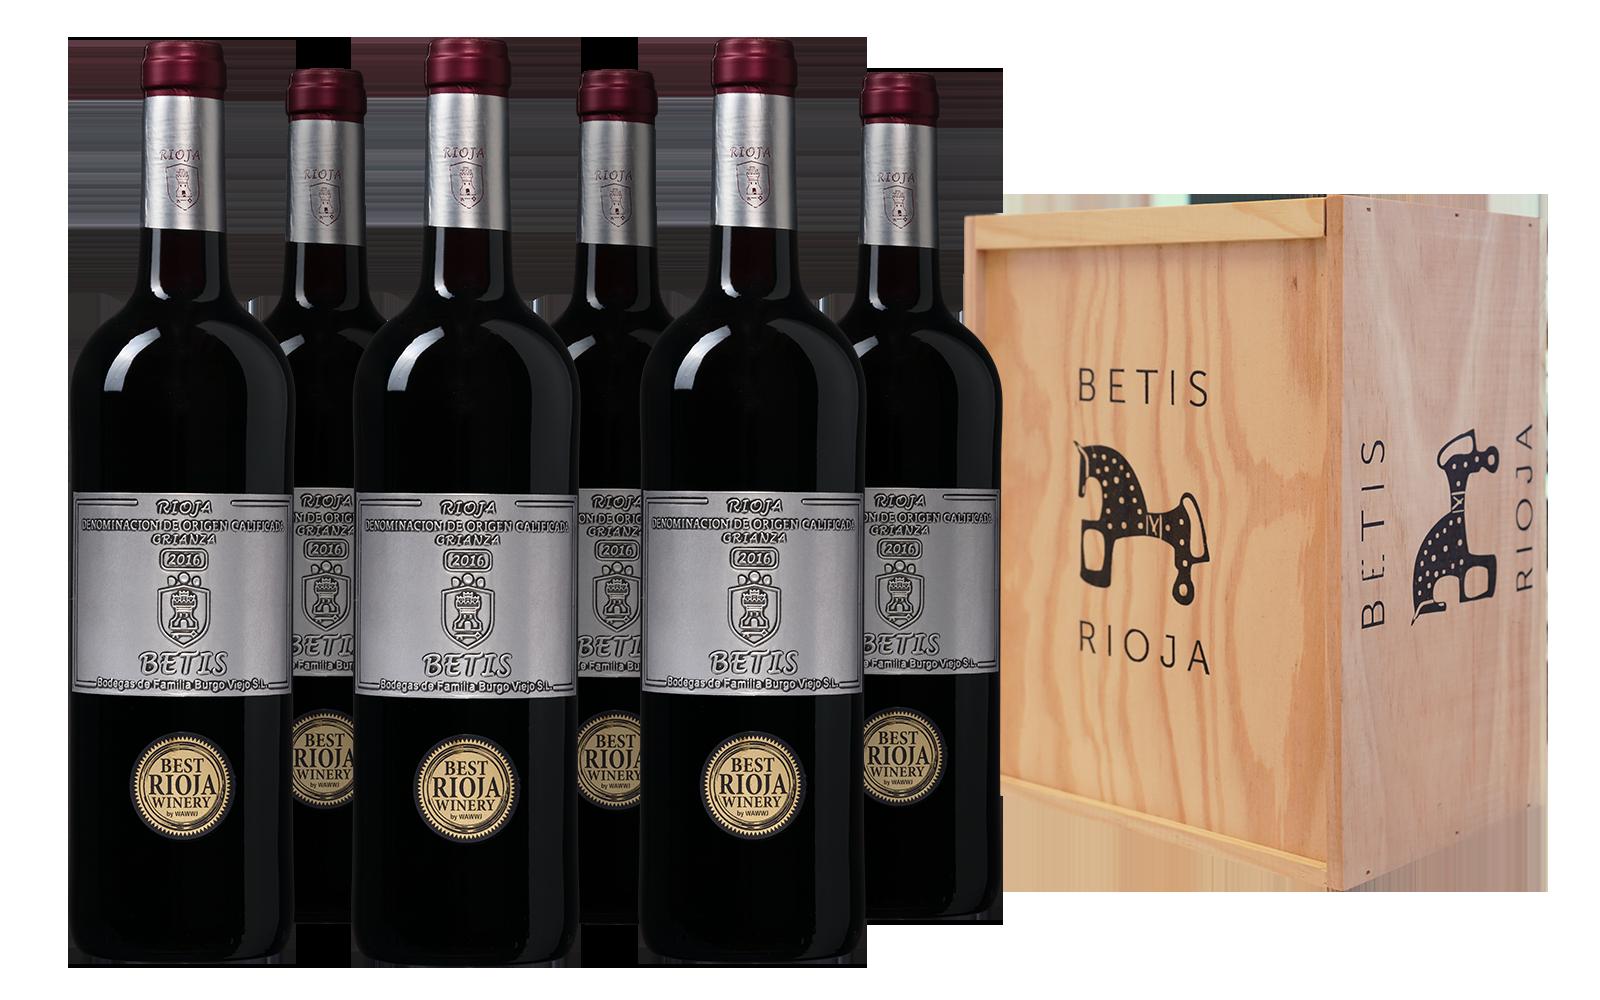 Betis Rioja Crianza Kist